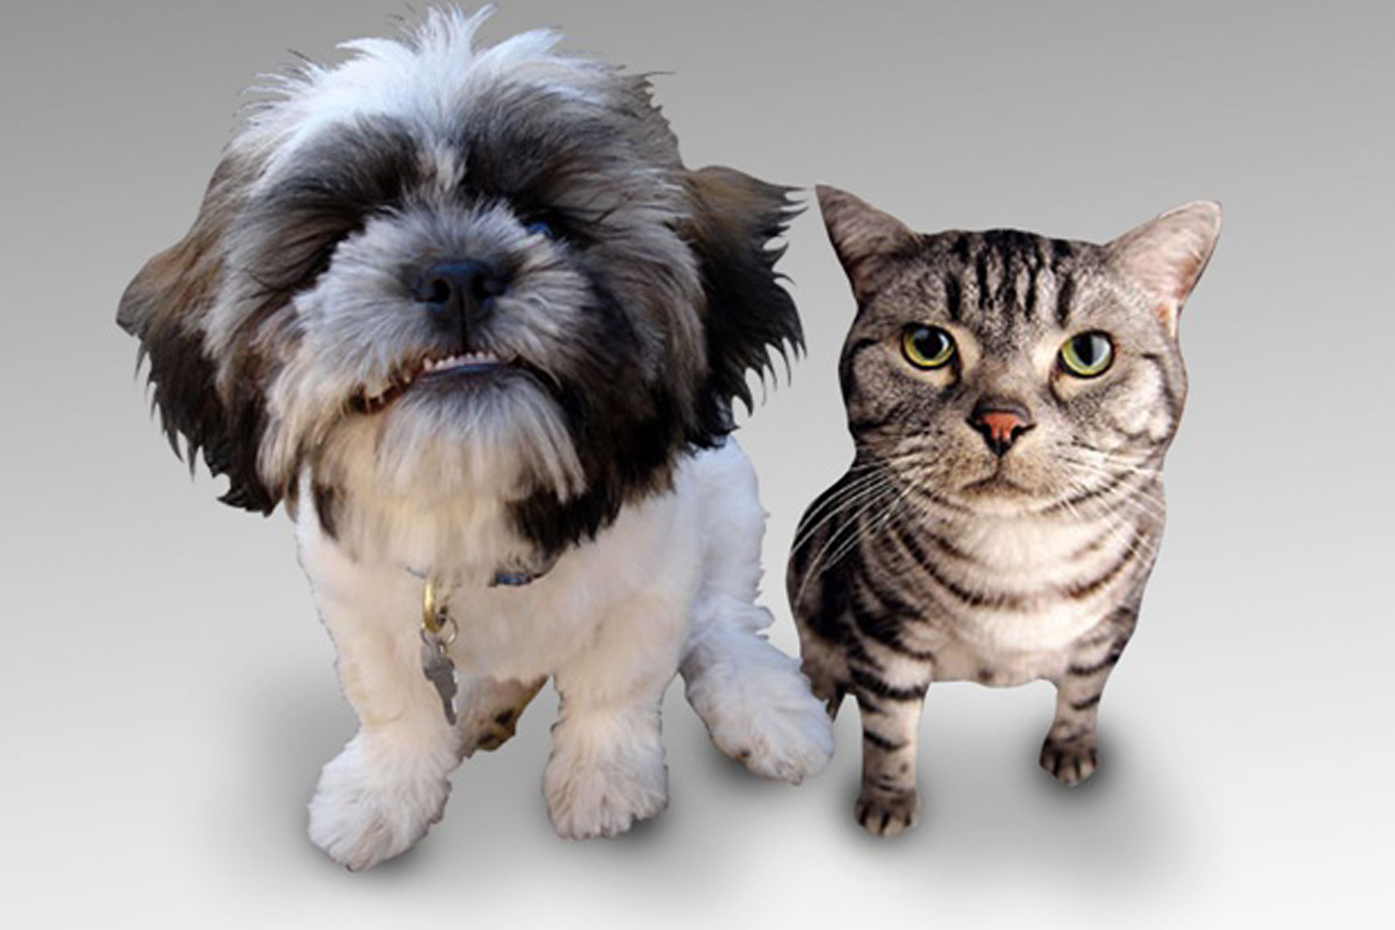 Dog and Cat_1439994237751.jpg